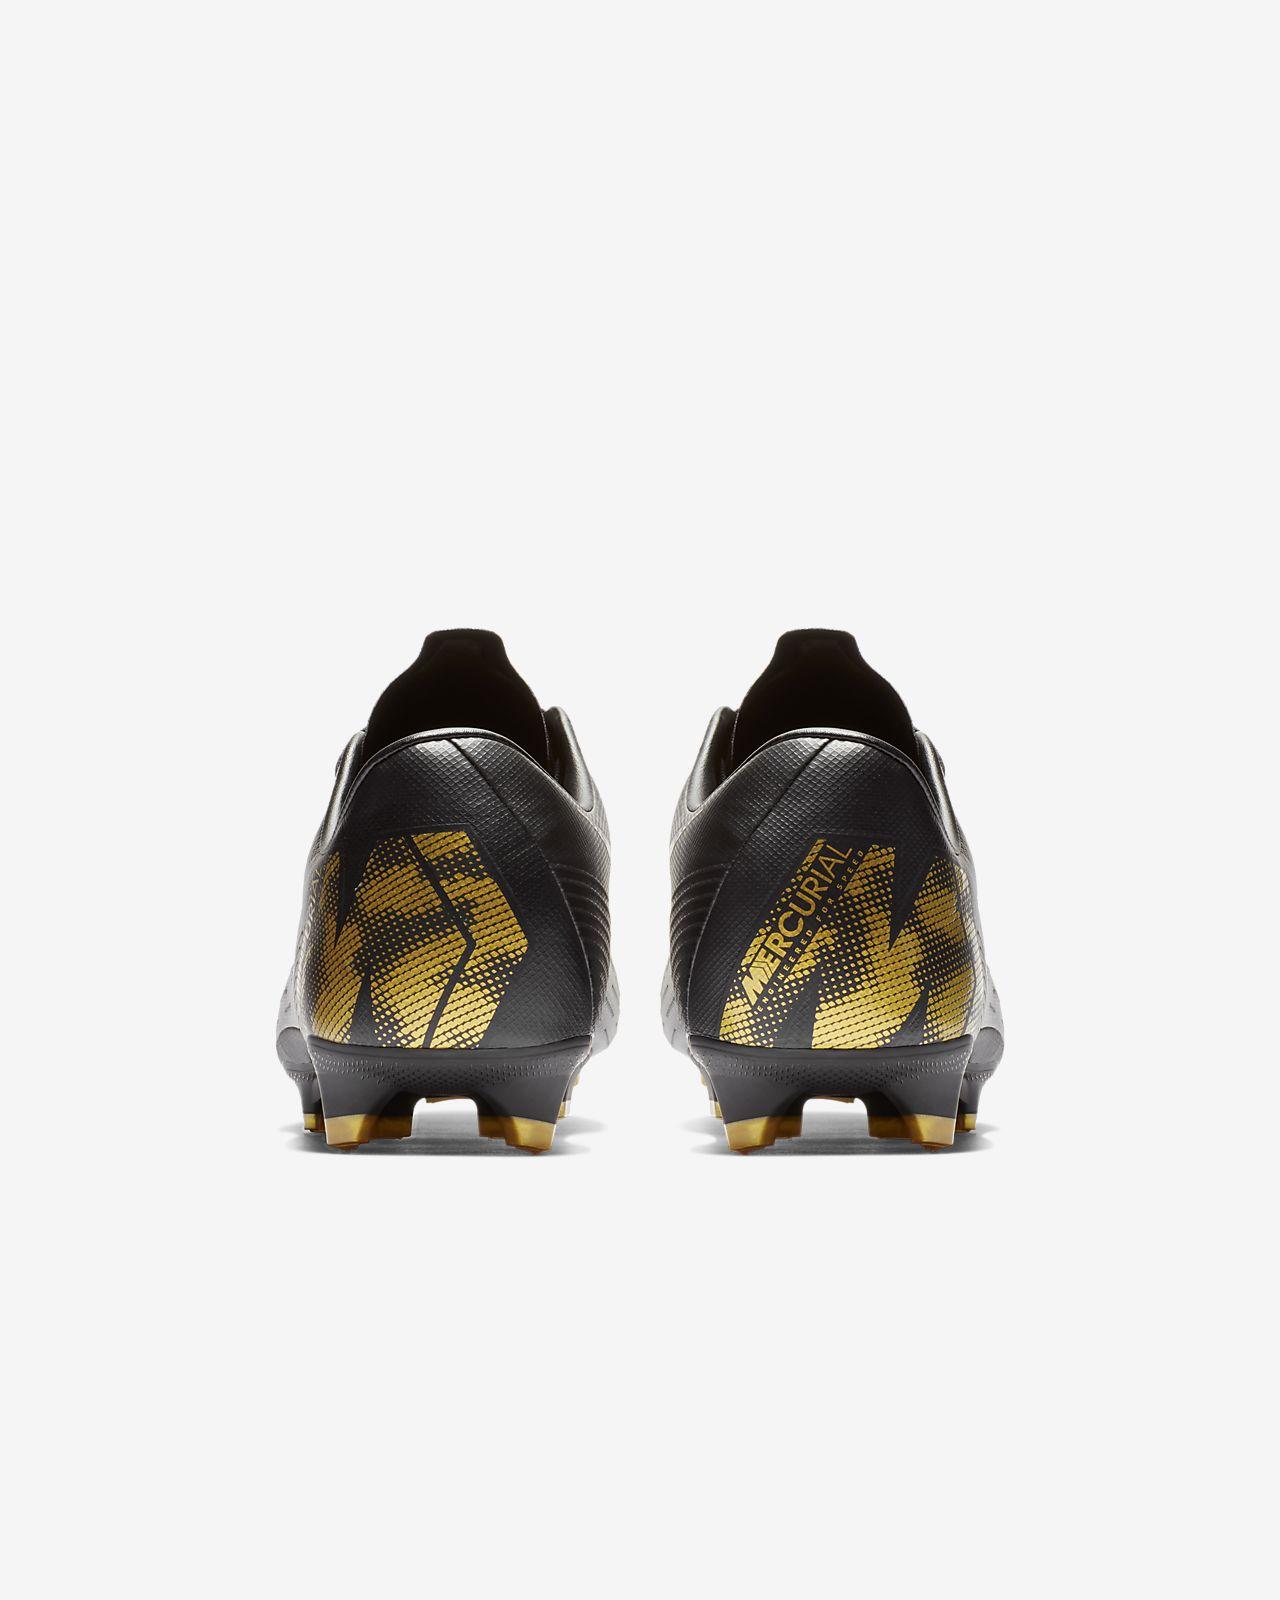 a97df70d3beb Nike Vapor 12 Pro FG Firm-Ground Soccer Cleat . Nike.com